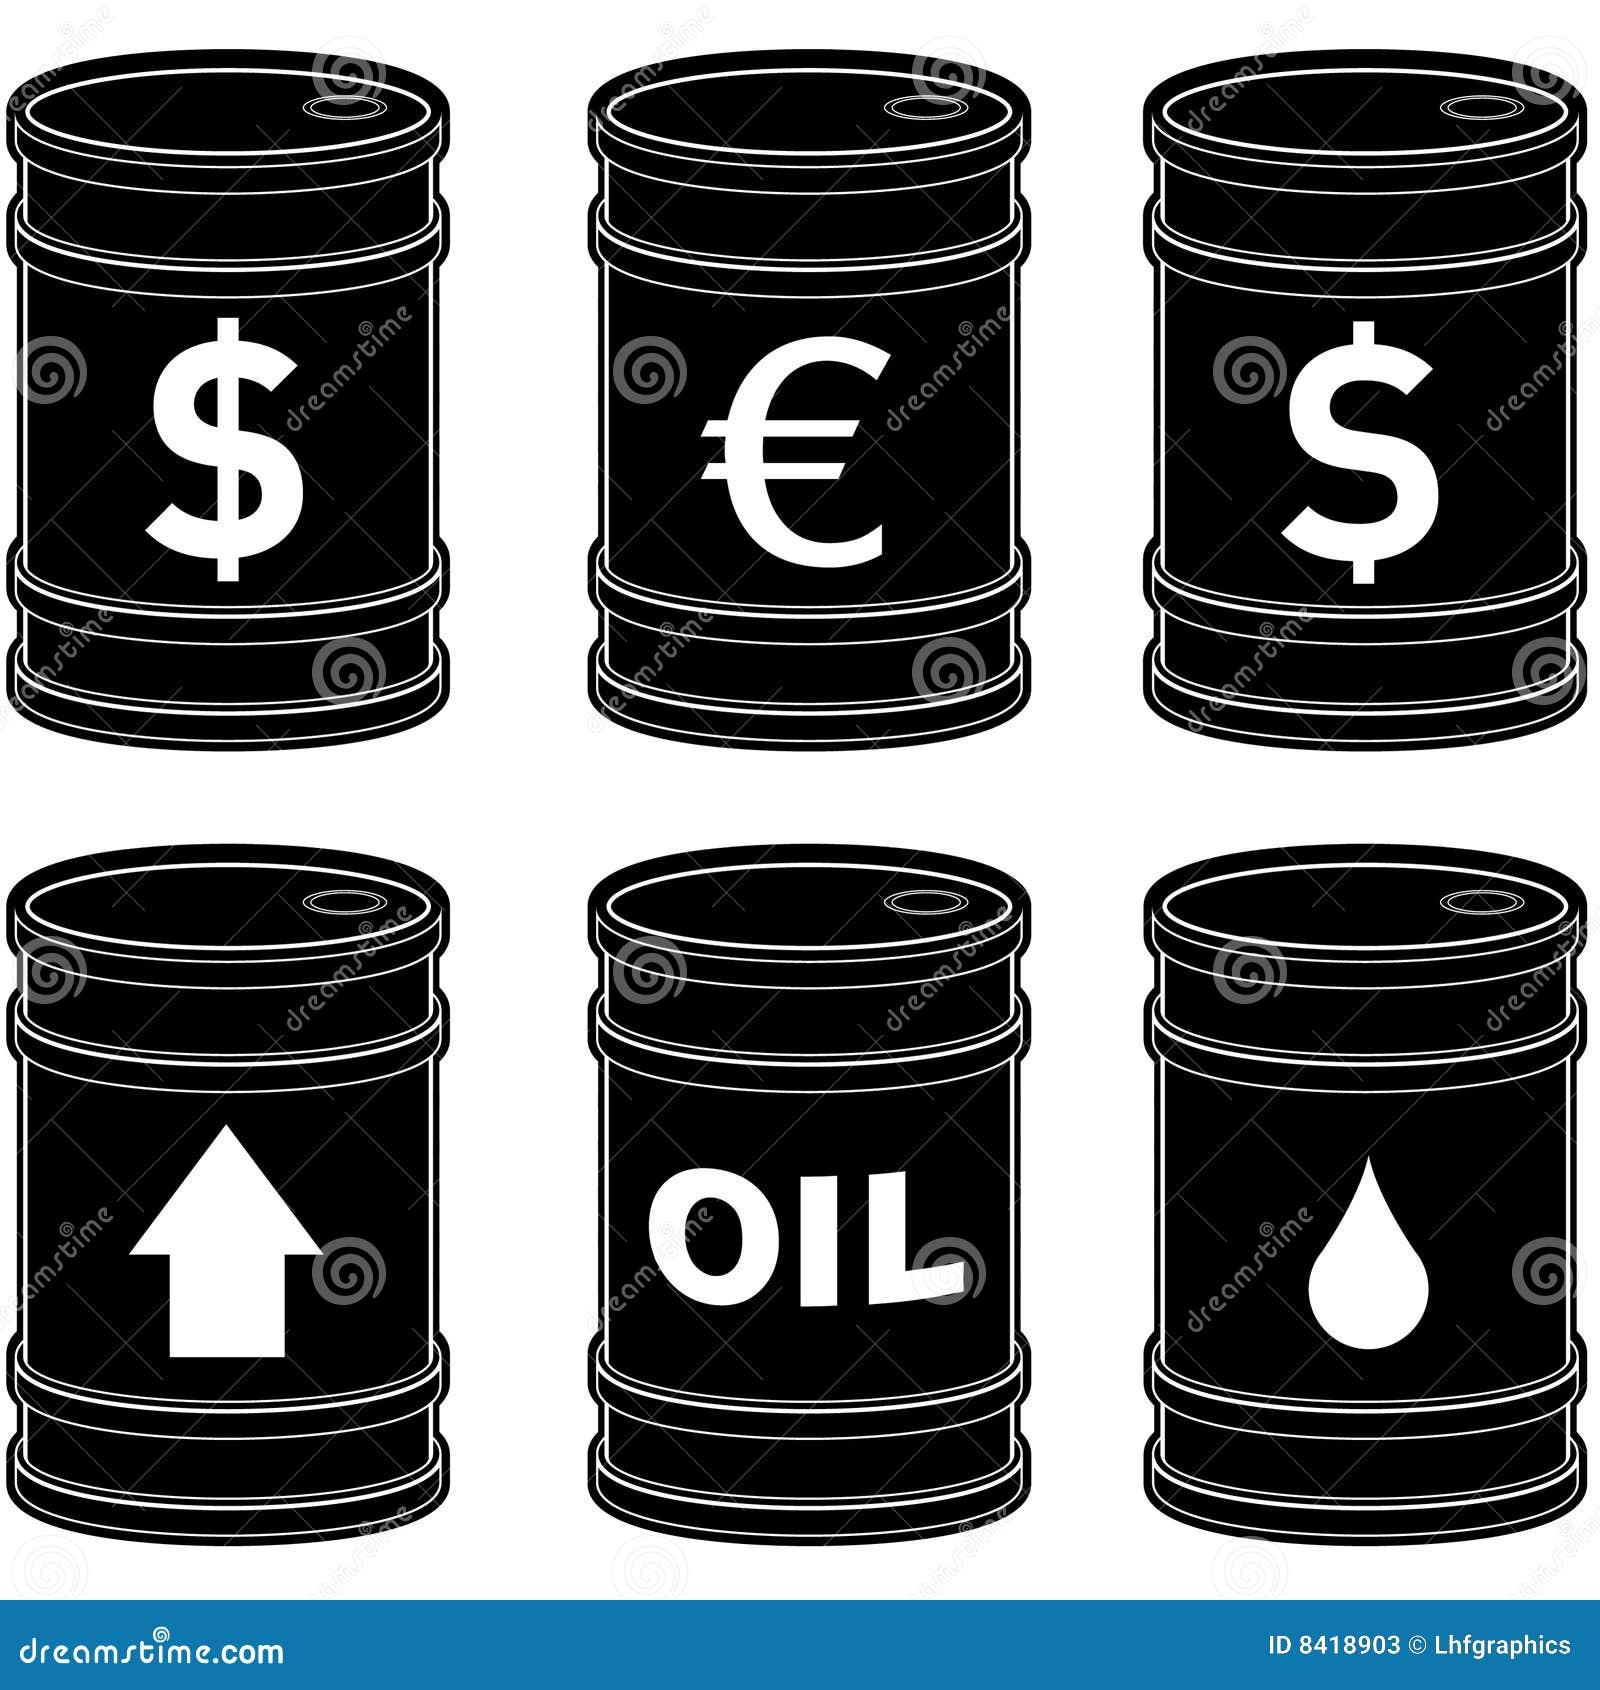 Flat black oil barrels with symbols stock vector illustration of royalty free stock photo buycottarizona